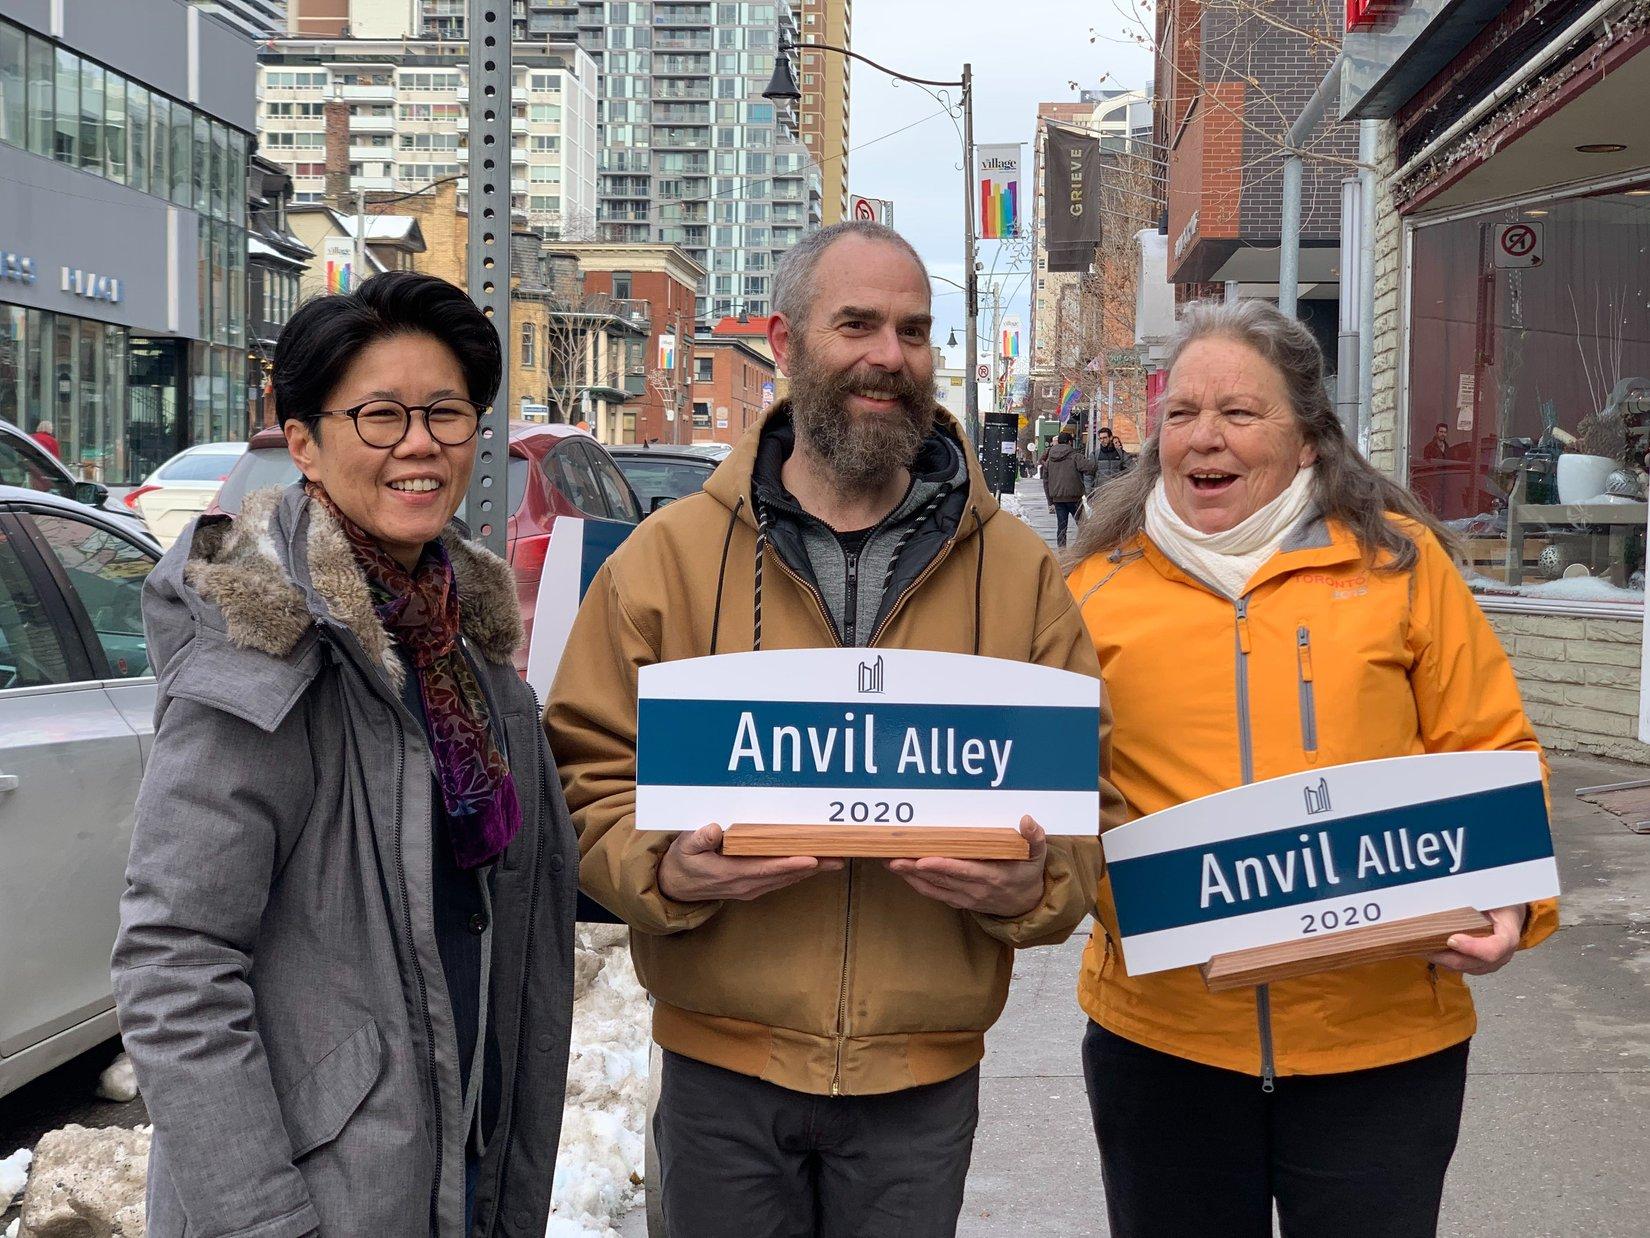 Anvil Alley